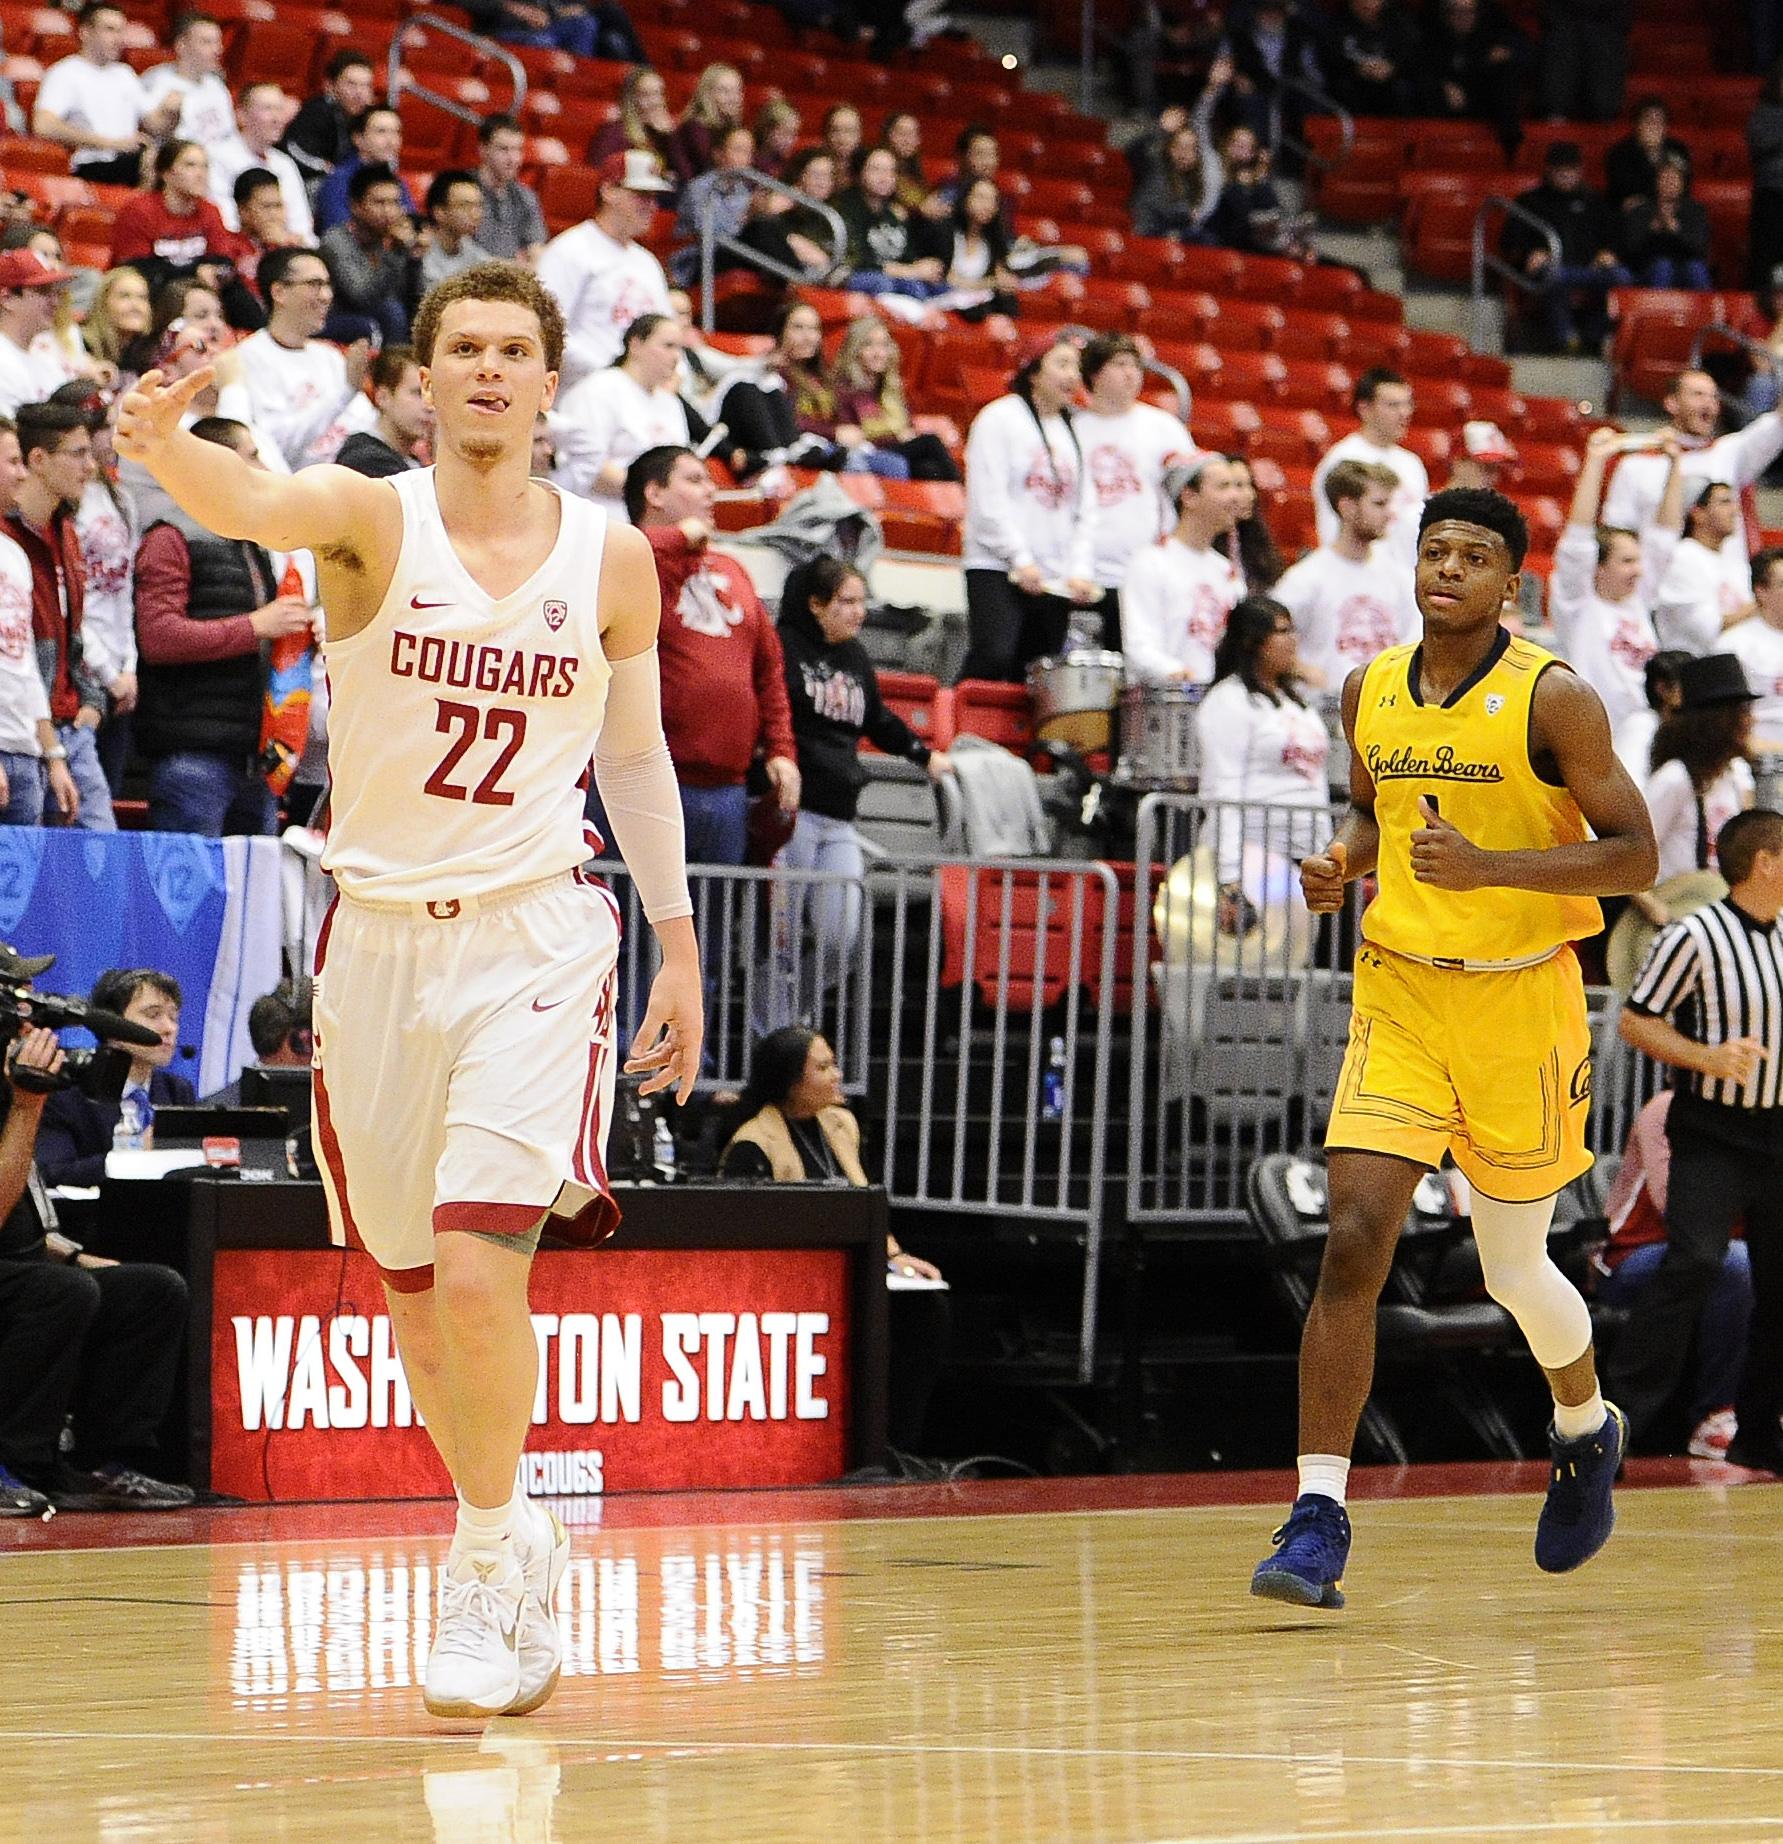 WSU Cougars Basketball